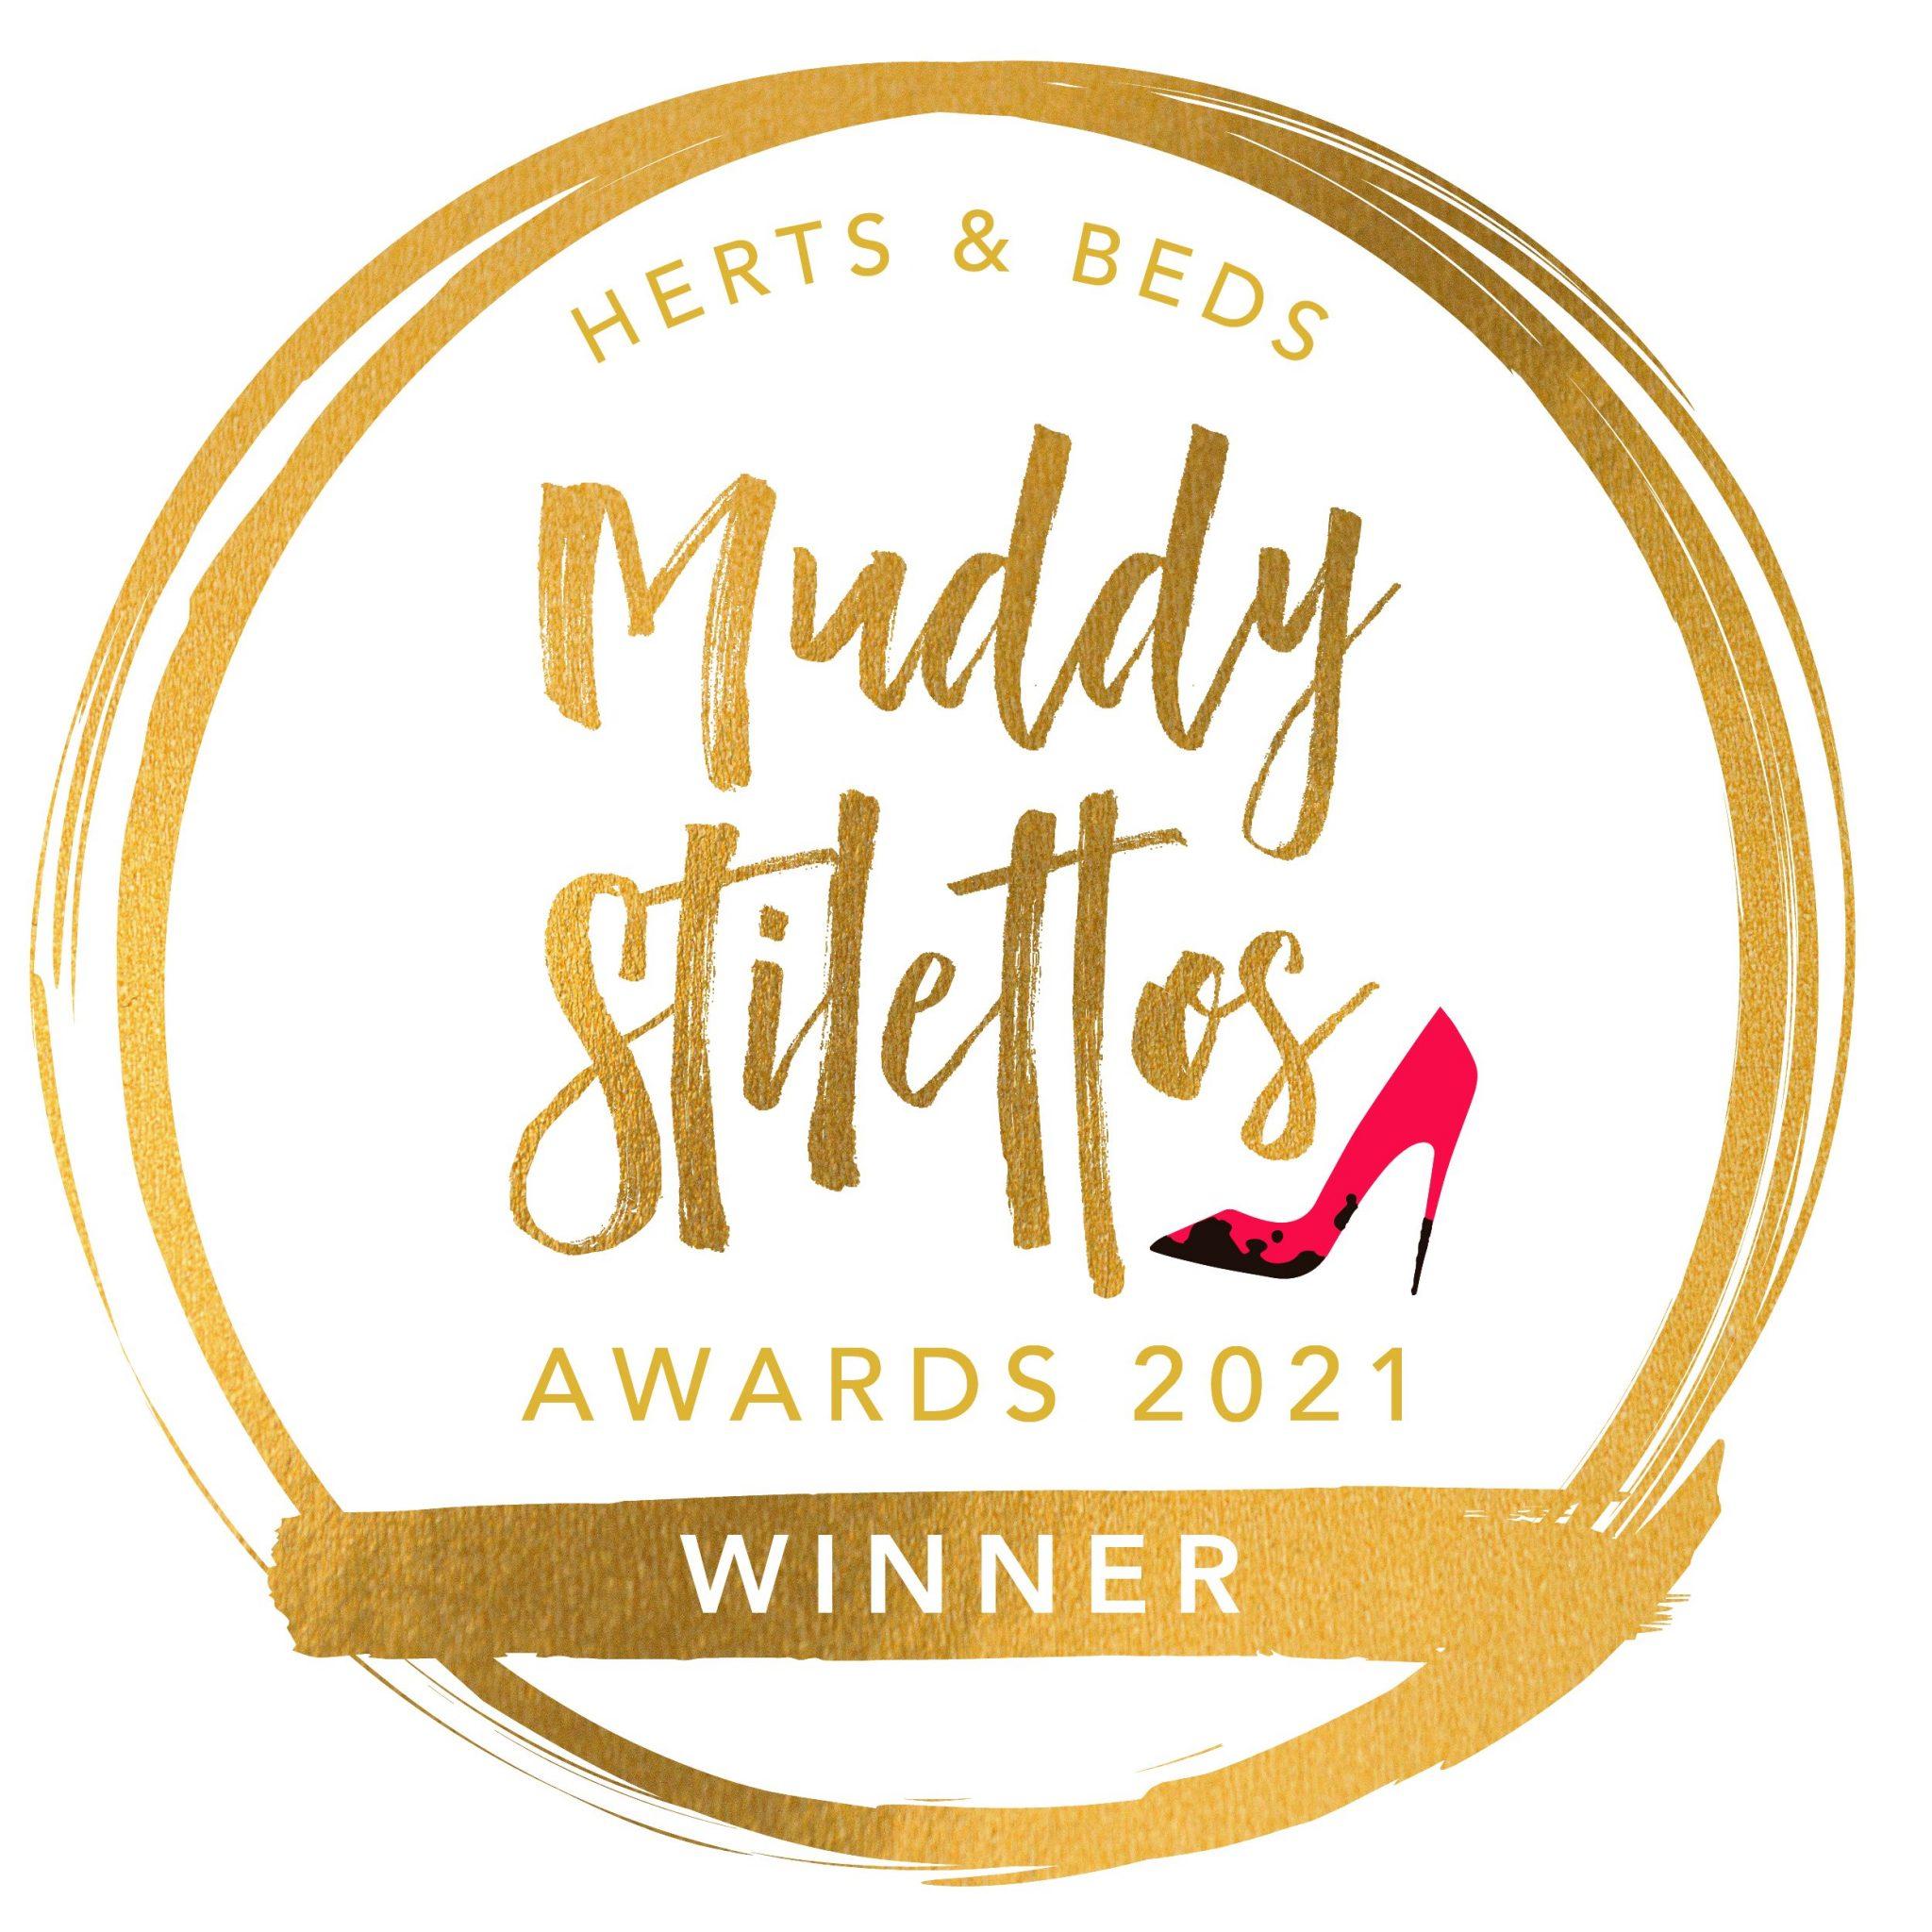 Winner in the Muddy Stilettos Awards 2021